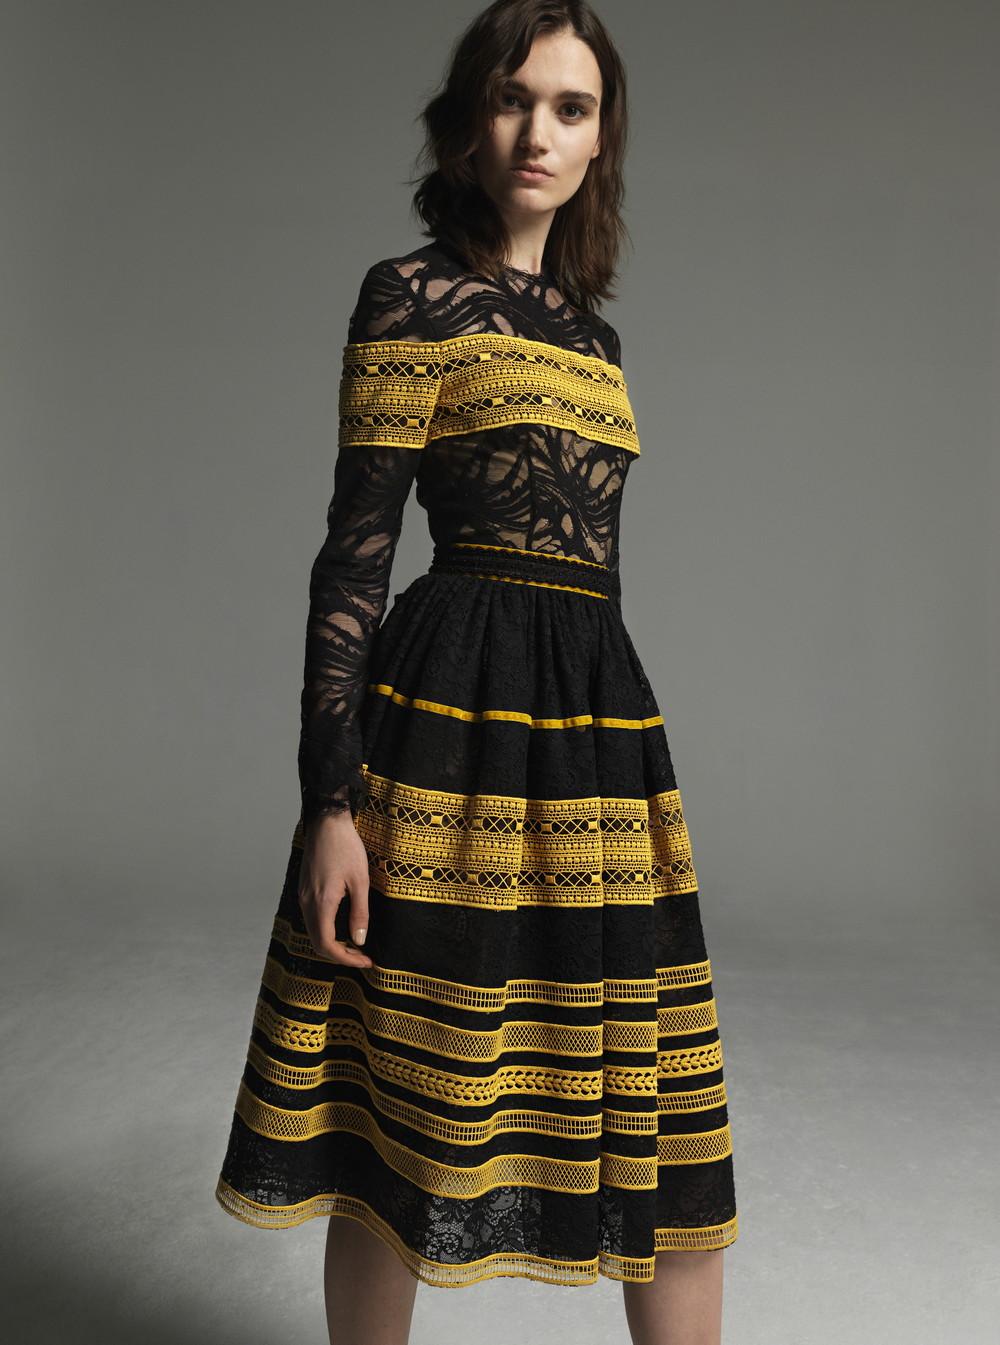 Dresses For Fall-Winter: